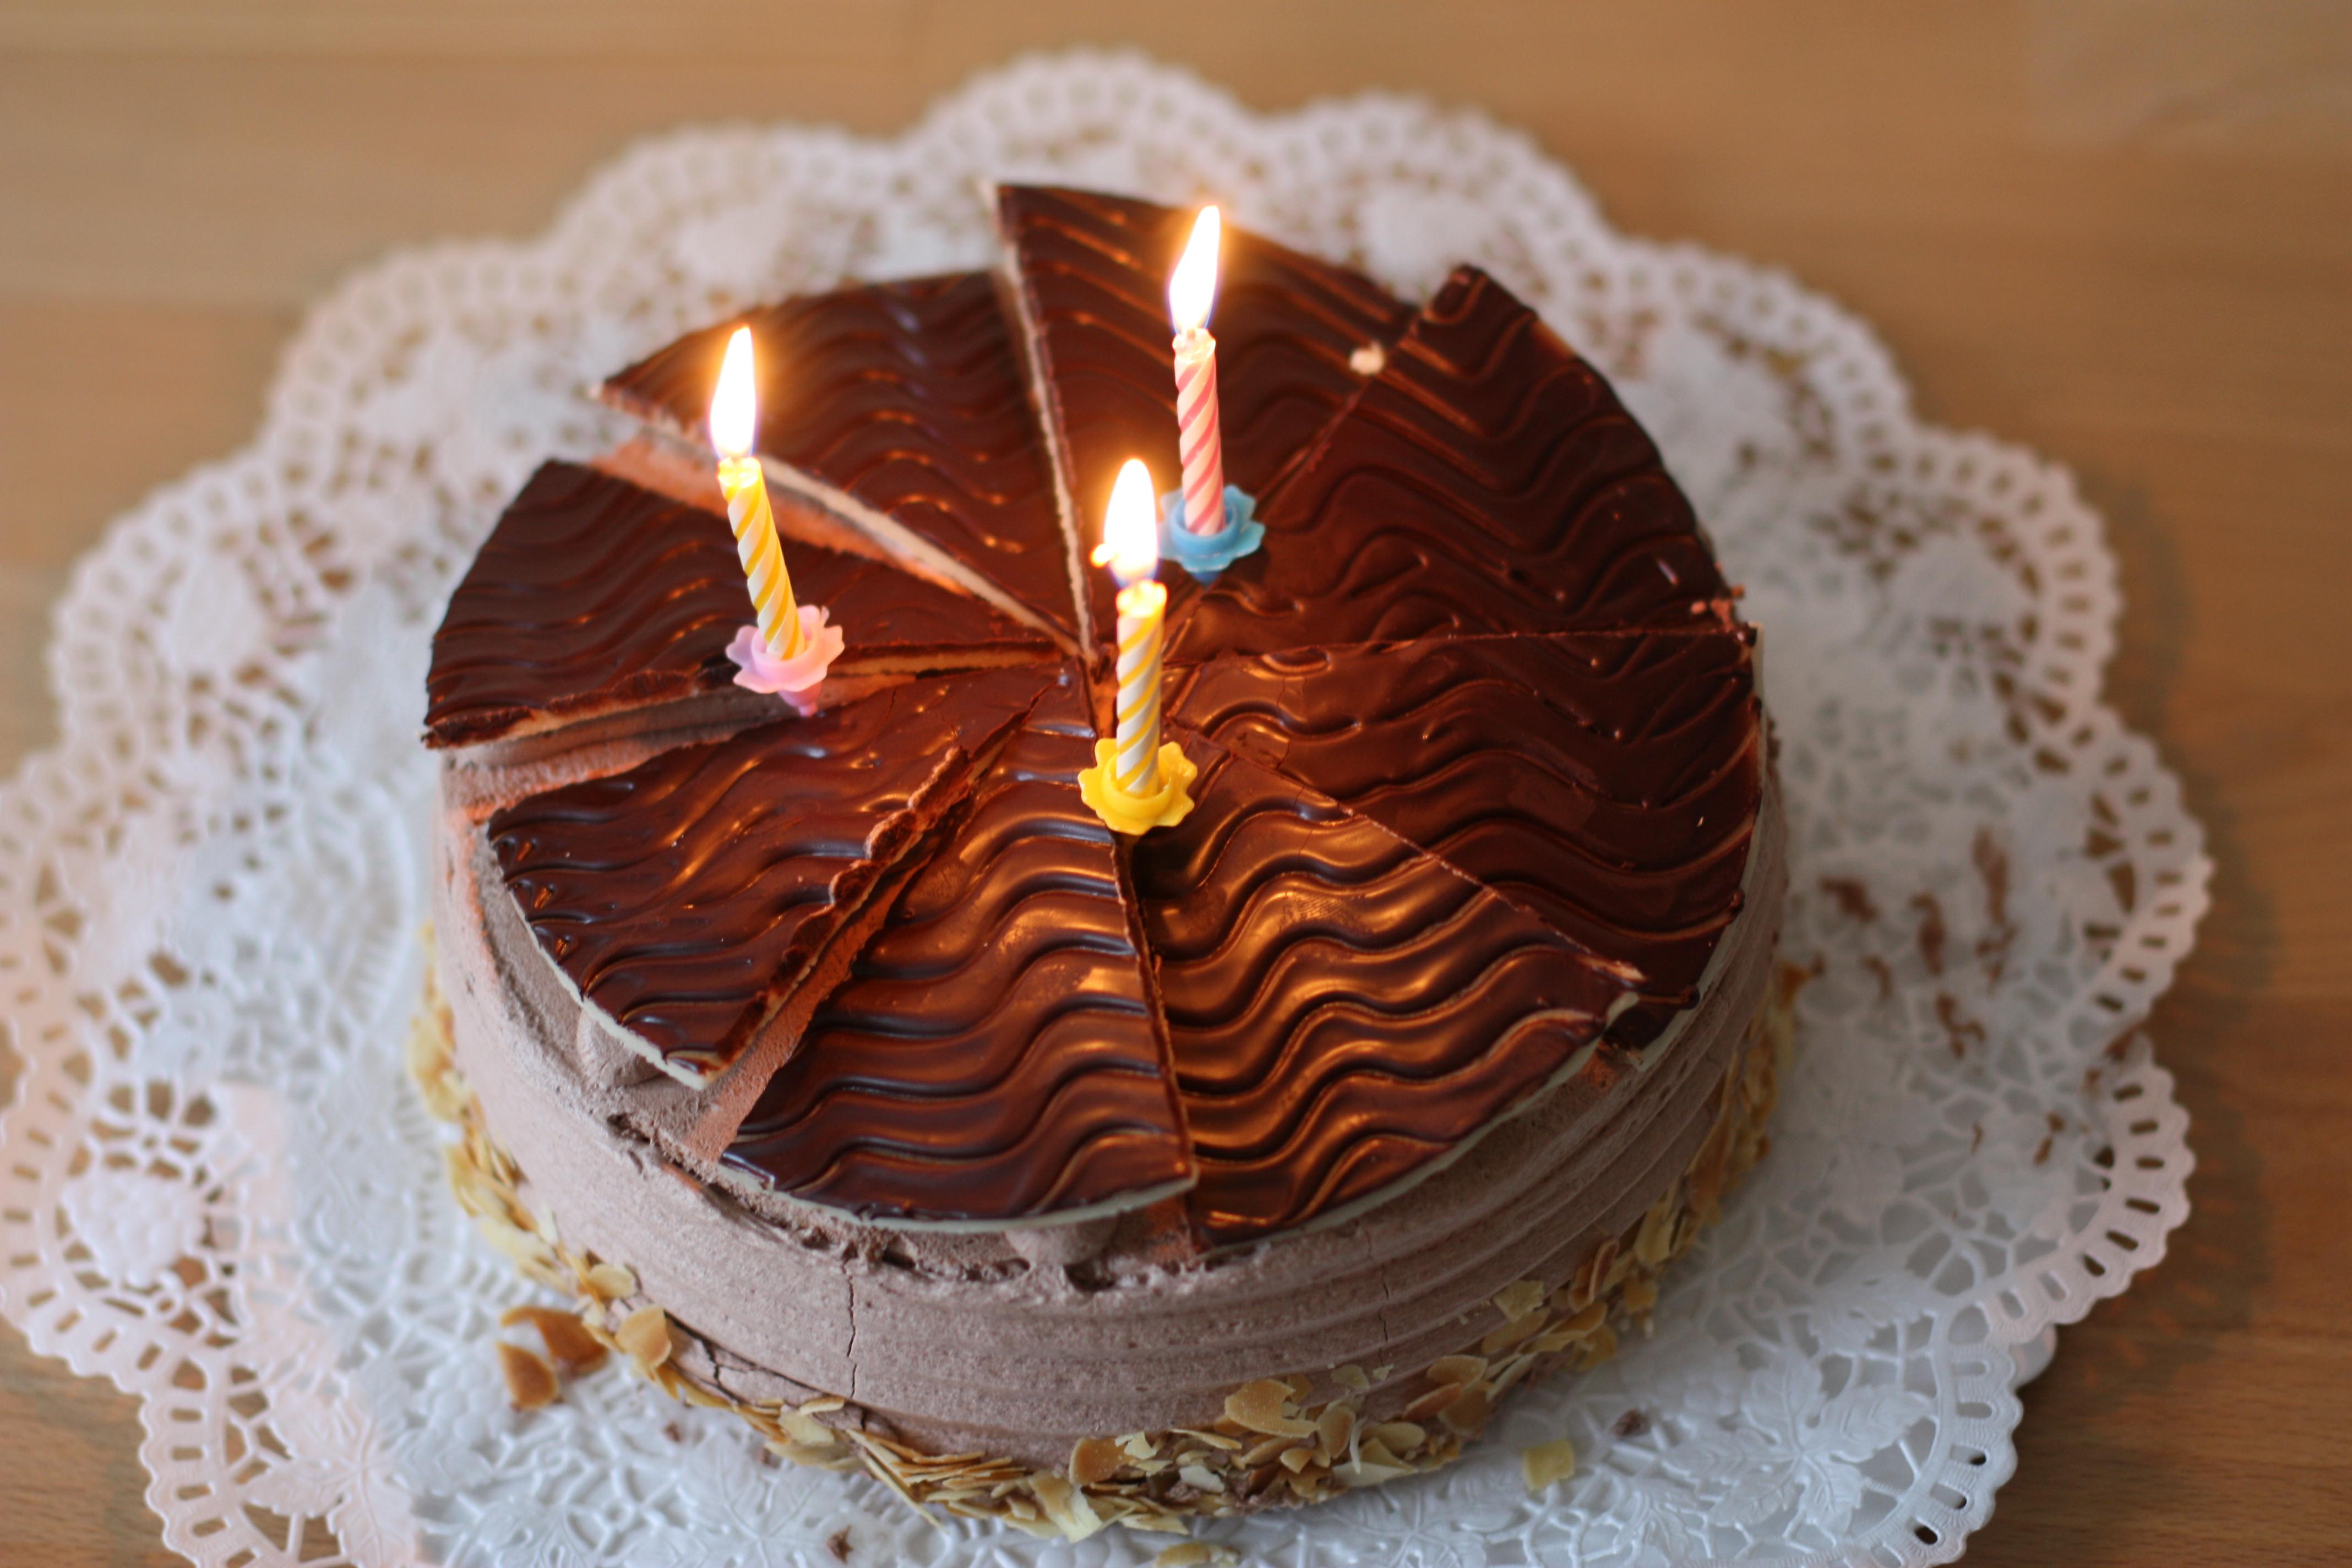 File Schokoladentorte Buttercreme Tulpen Dritter Geburtstag 006 Jpg